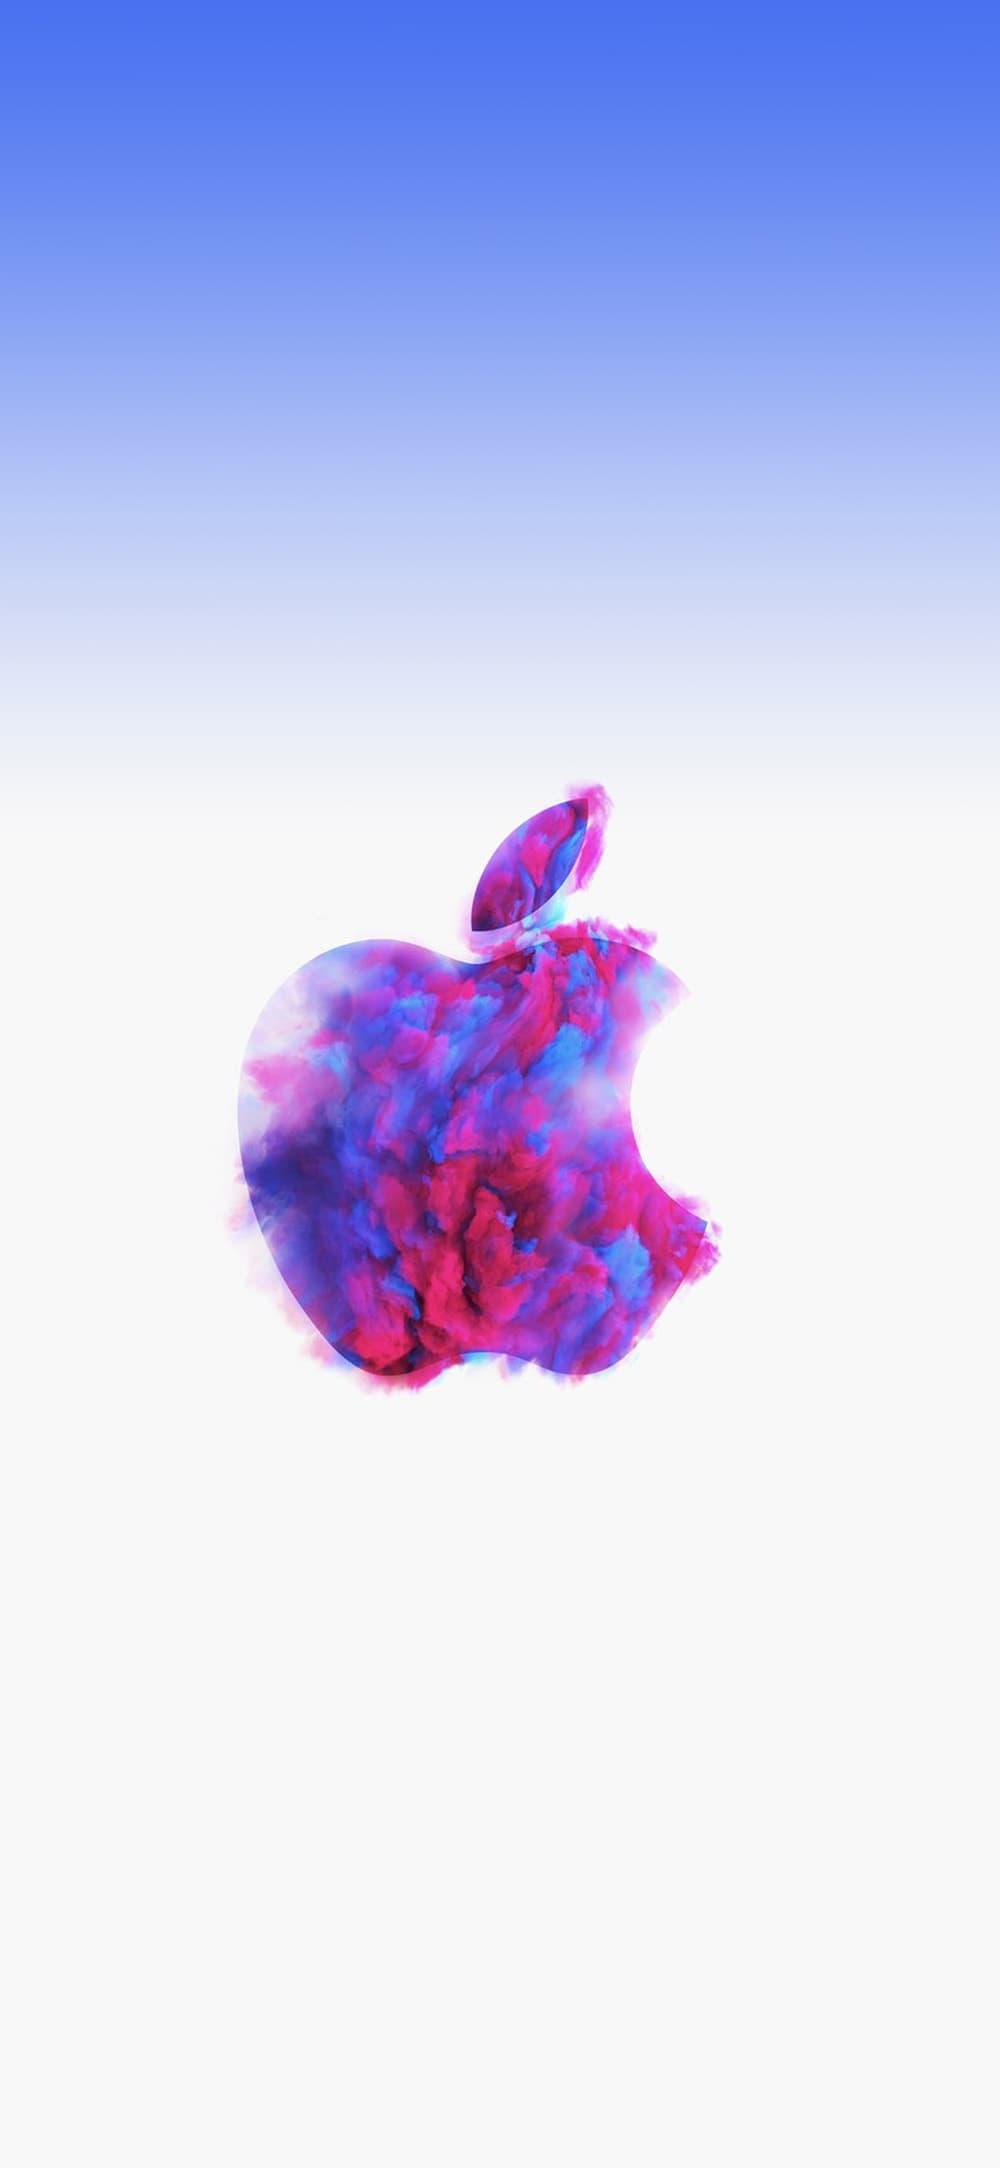 خلفيات ايفون 11 Apple Wallpaper Iphone Wallpaper Iphone Wallpaper Video